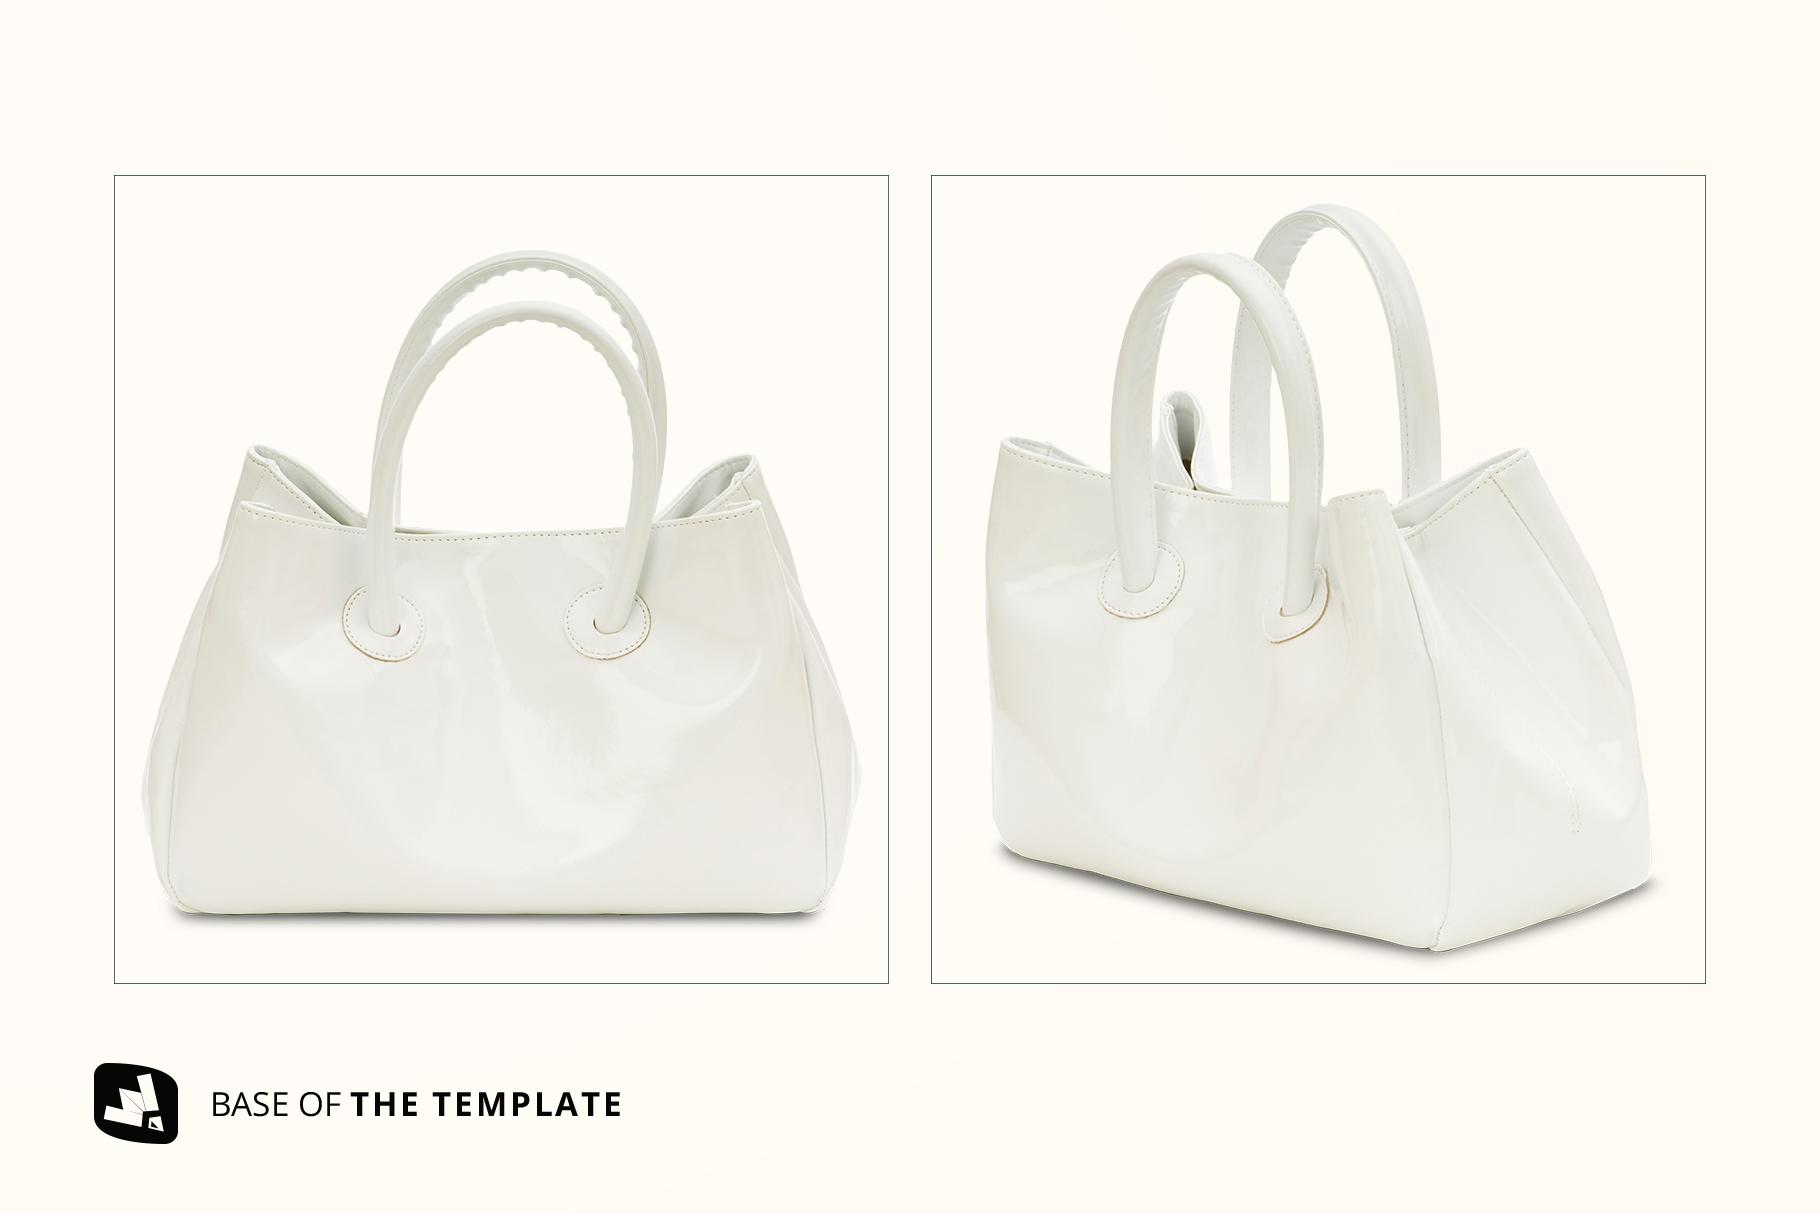 base image of the female handbag mockup